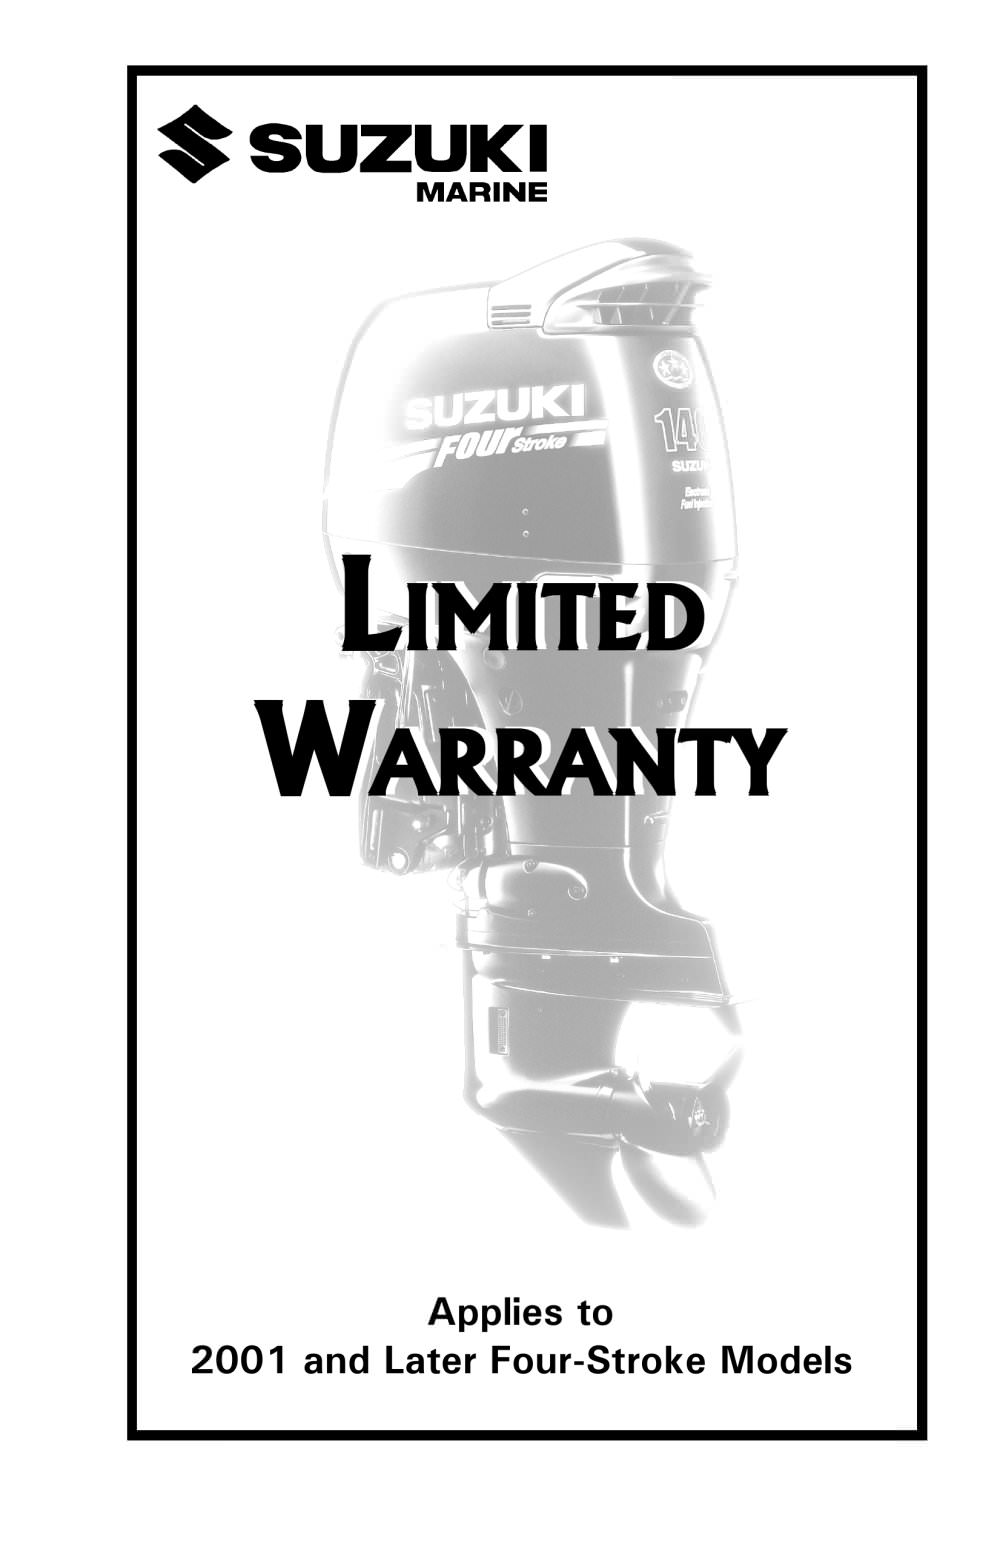 suzuki limited warranty booklet suzuki marine pdf catalogues rh pdf nauticexpo com suzuki df250 outboard owners manual Suzuki 4 Stroke Outboards